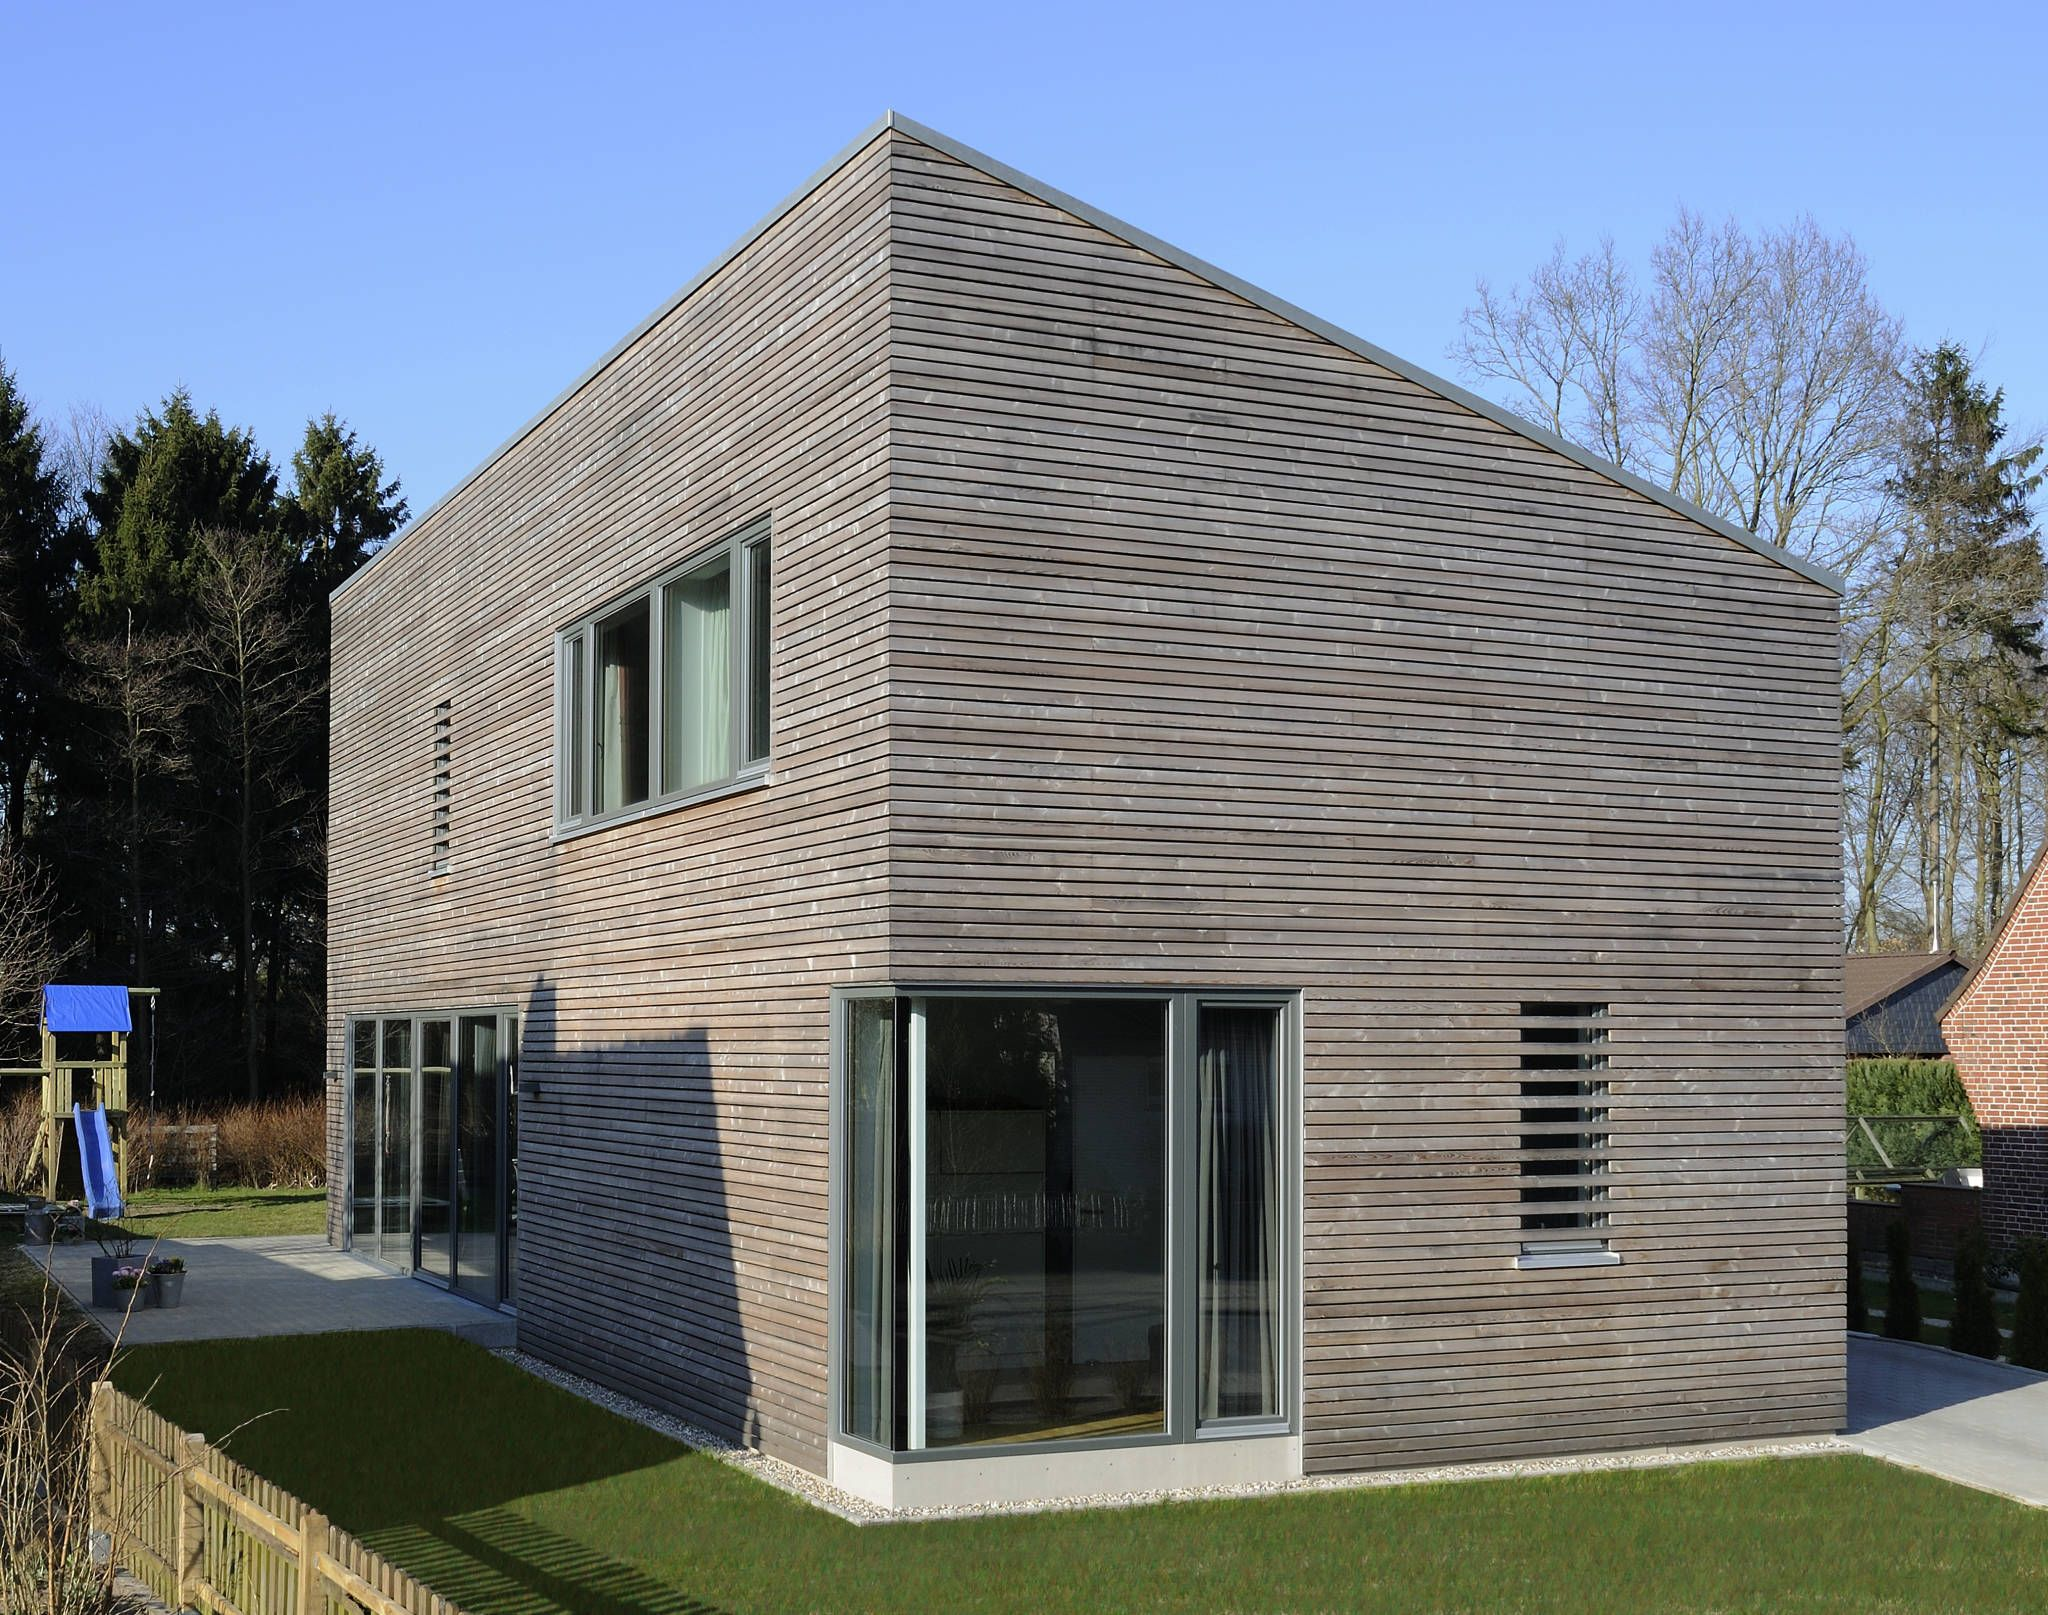 Moderne holzhäuser architektur  Moderne Häuser Bilder: Ansicht Giebel | Moderne häuser, Ansicht ...